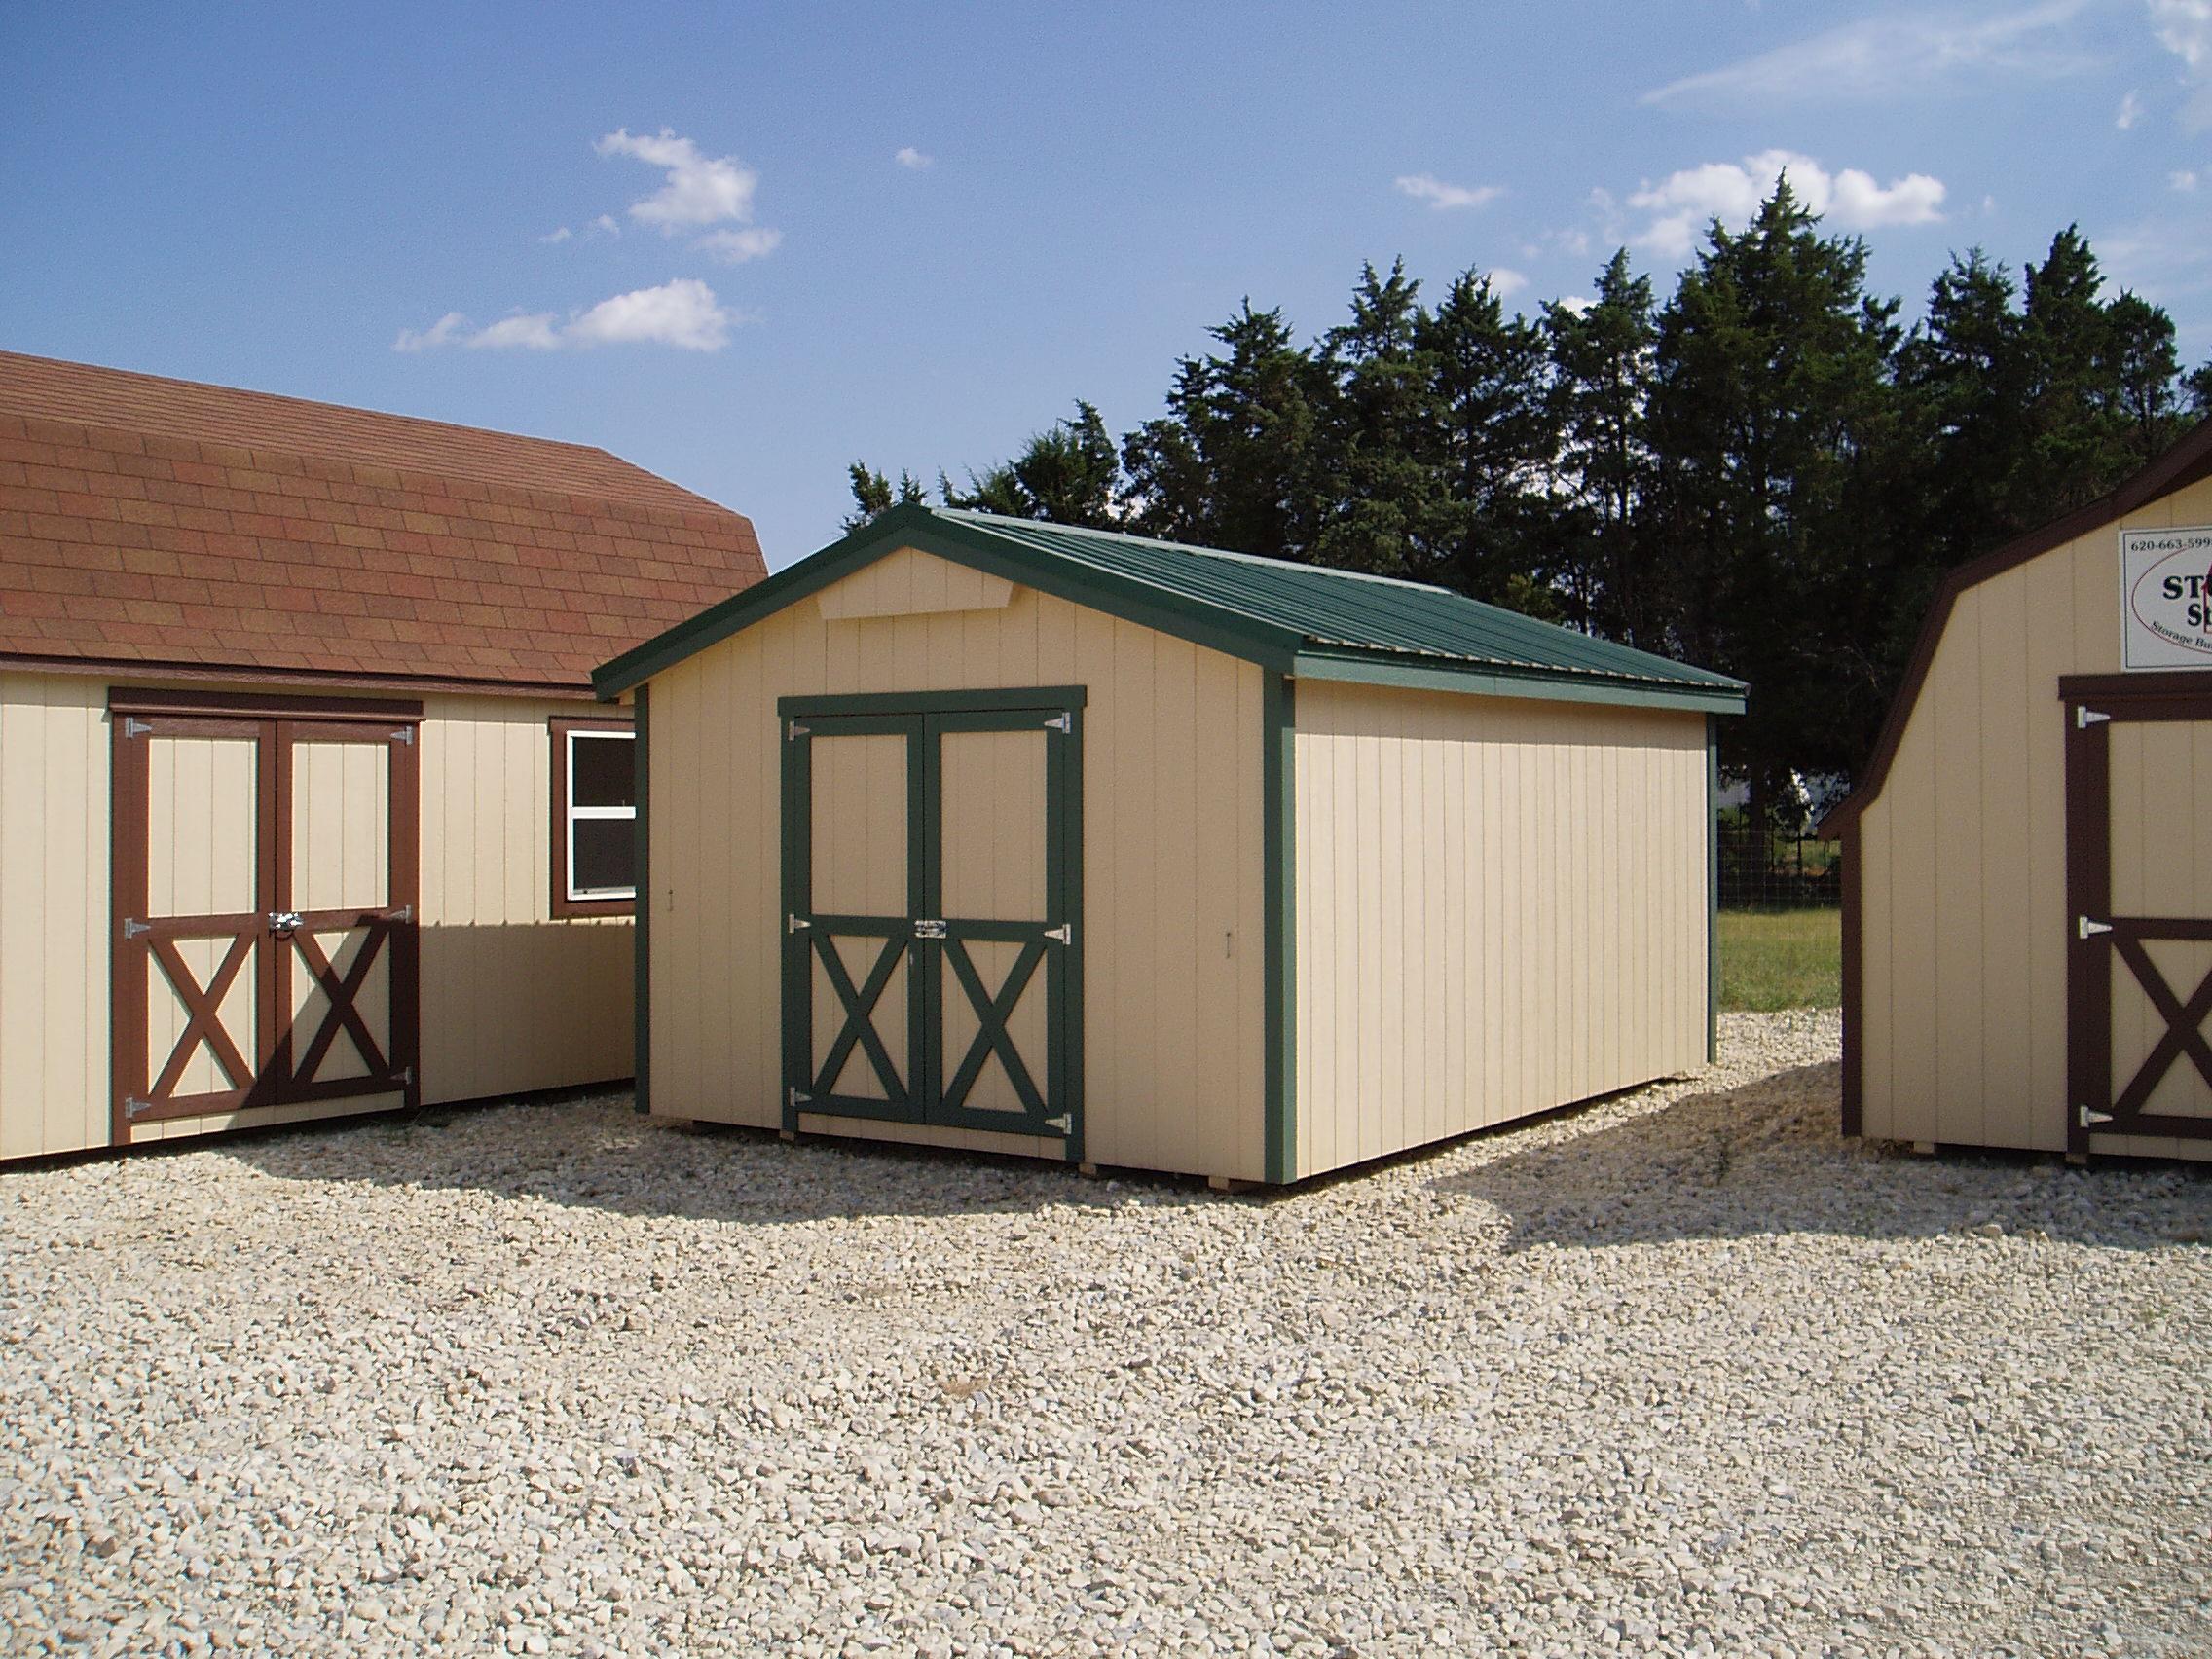 OLYMPUS DIGITAL CAMERA Kansas Outdoor Structures